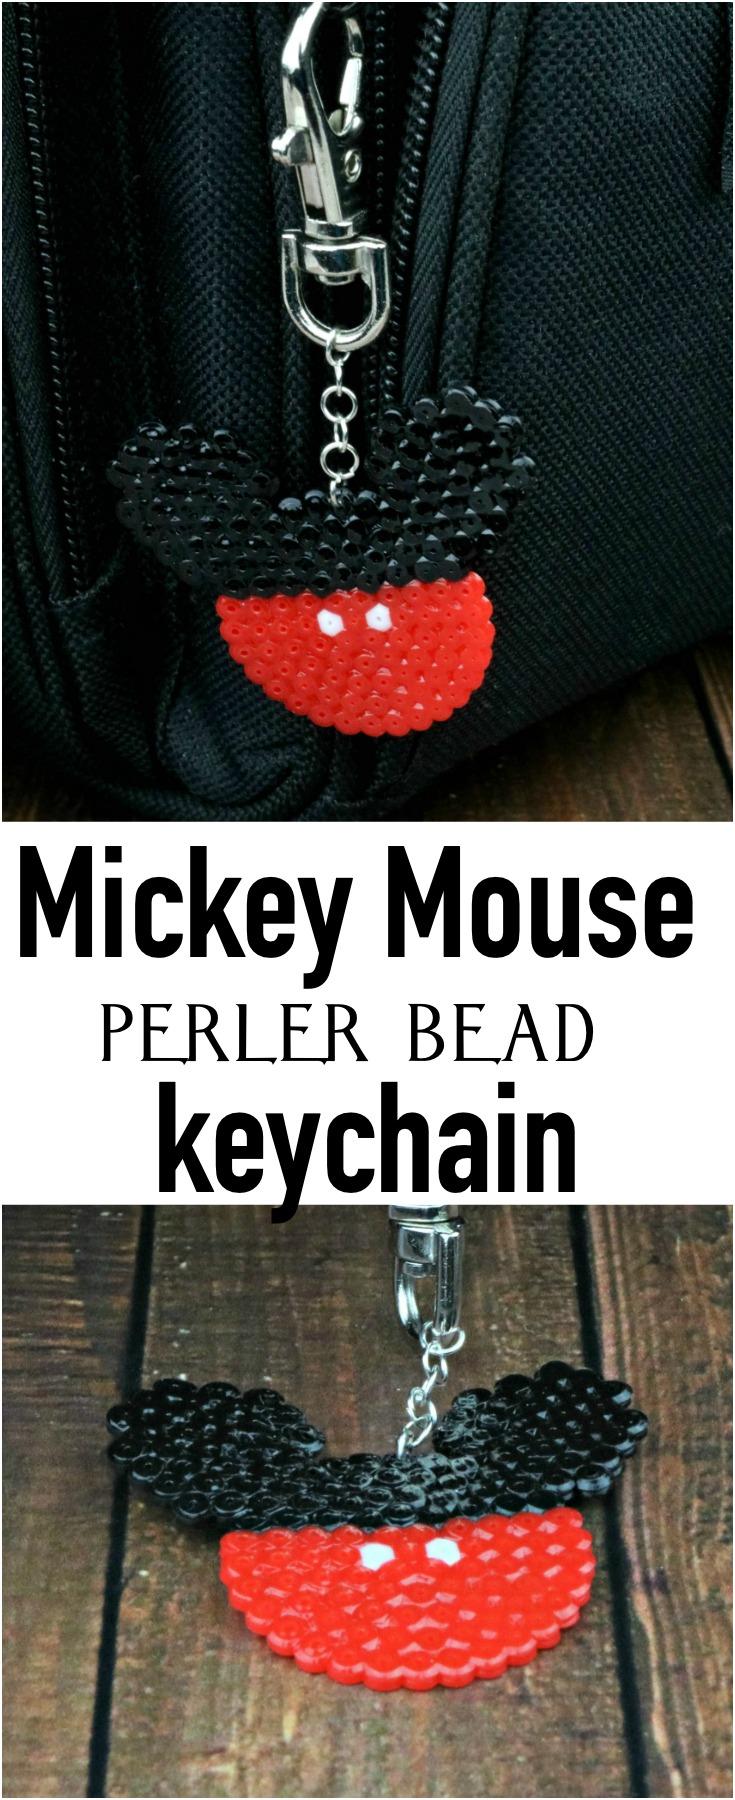 Perler Bead Mickey Mouse Keychain